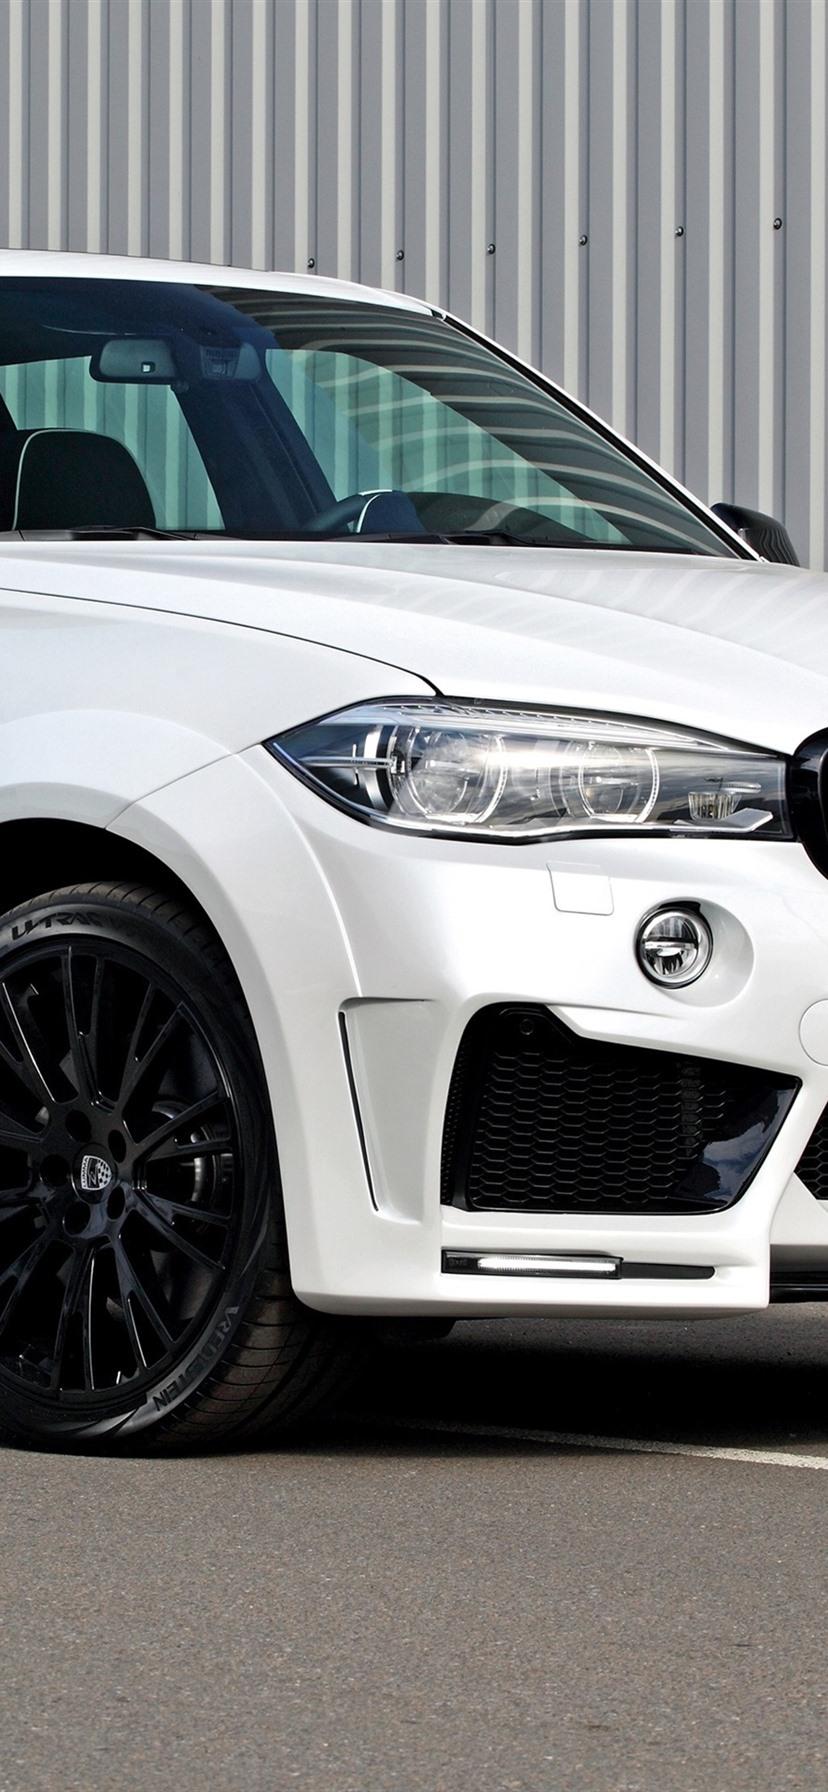 BMW F15 Weies SUV Auto 3840x2160 UHD 4K Hintergrundbilder